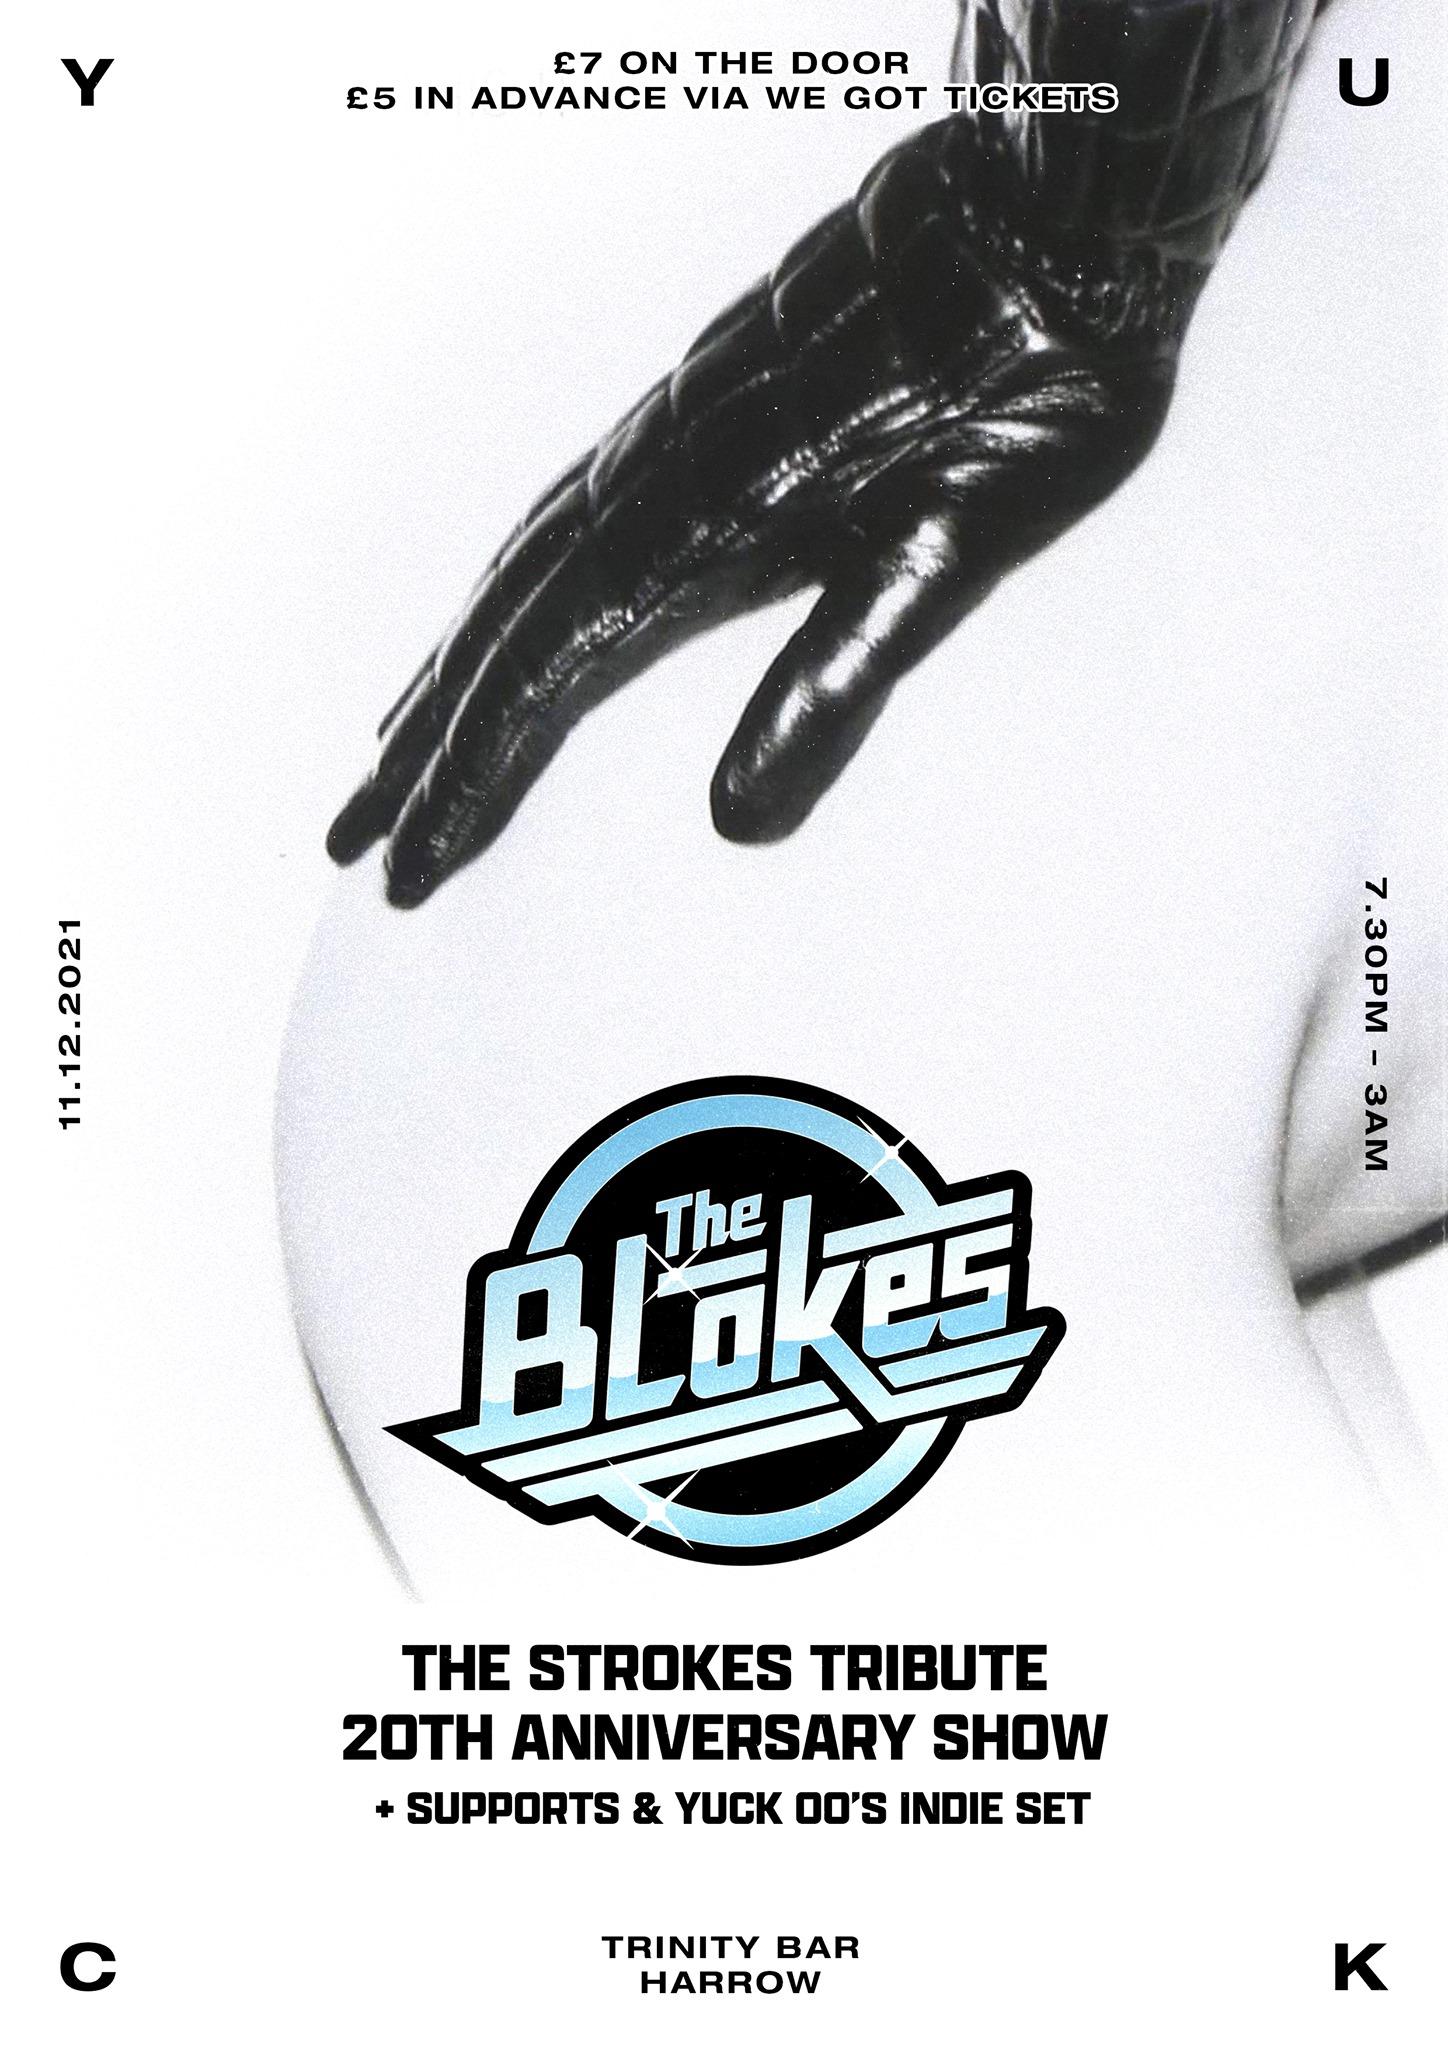 The Blokes - Strokes Tribute